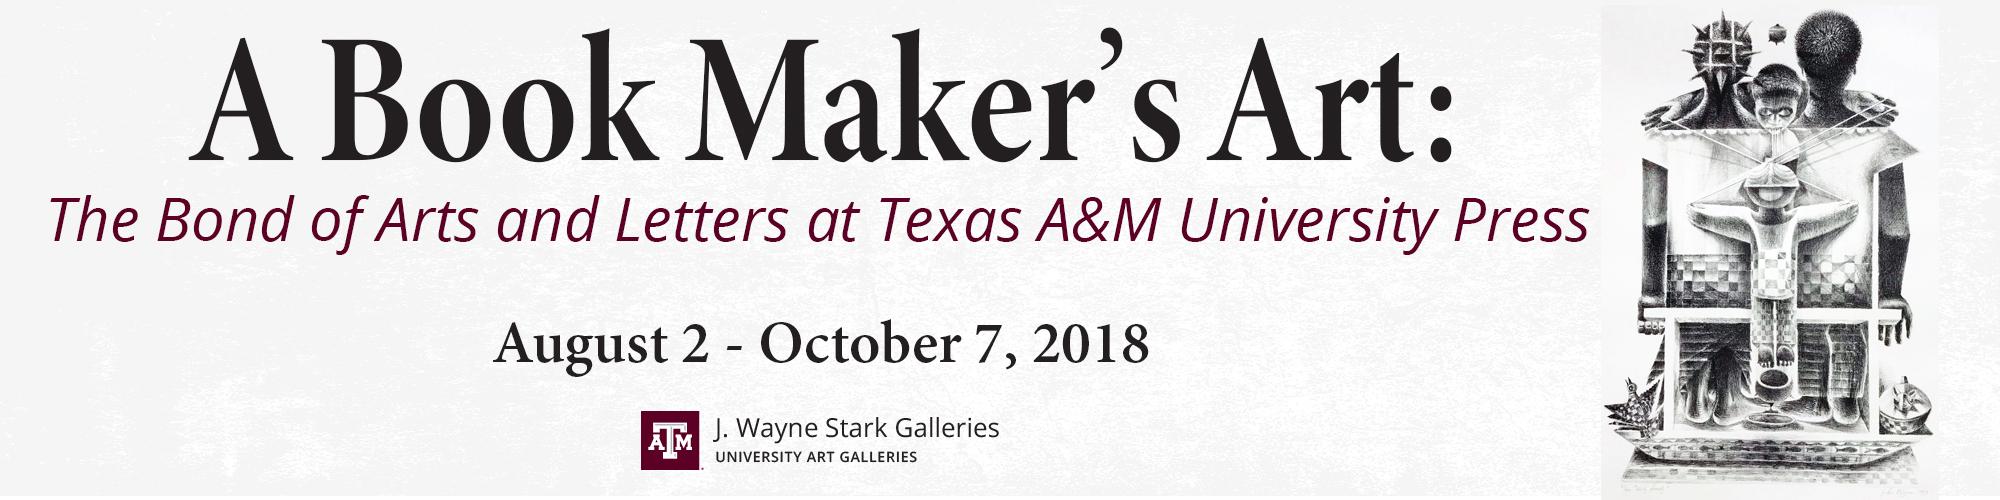 Book Maker's Art Exhibition